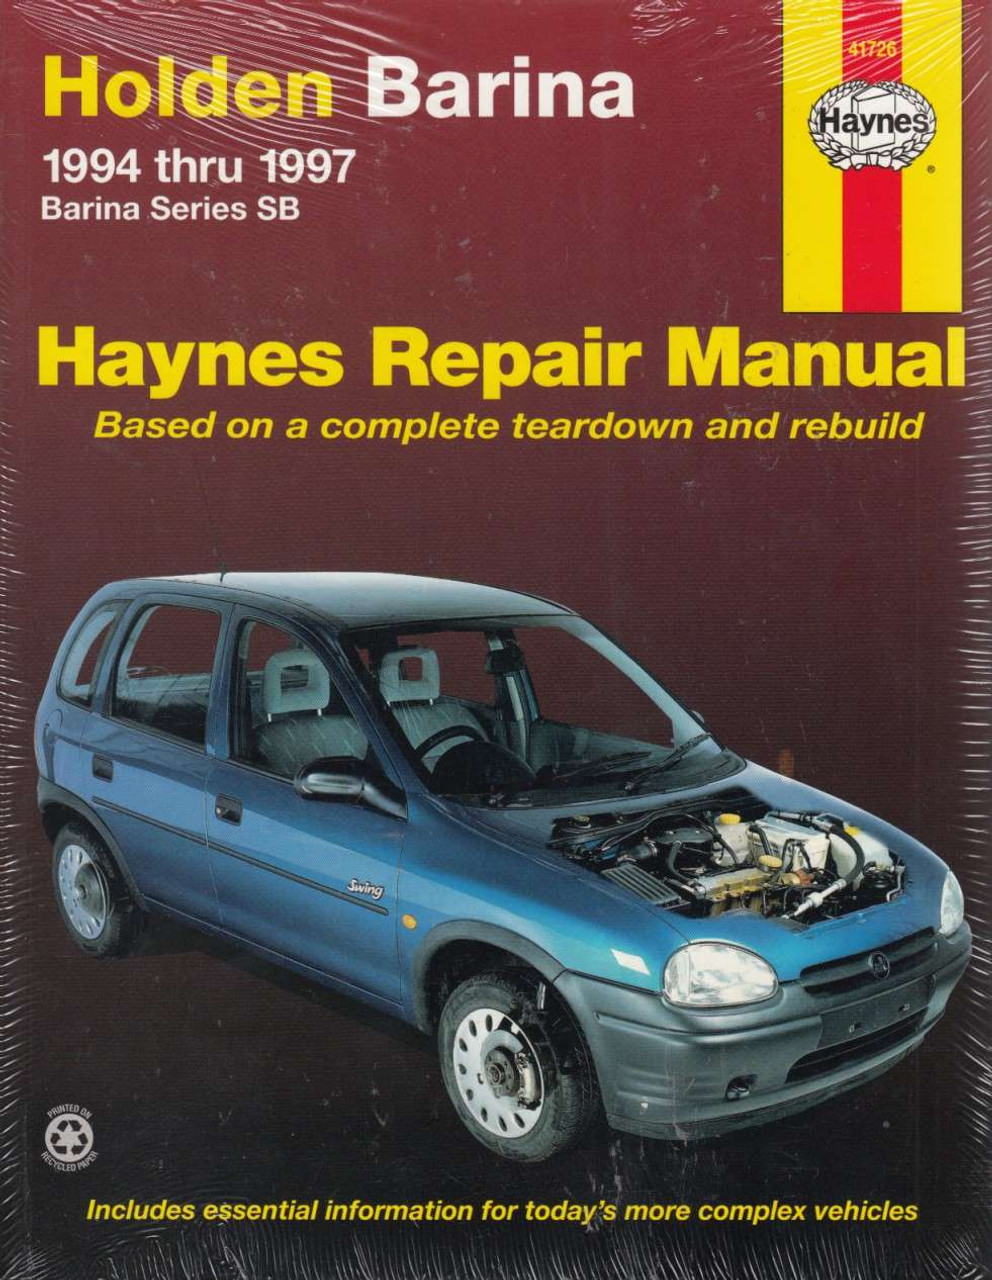 holden barina series sb 1994 1997 workshop manual rh automotobookshop com au Holden Barina Icon Holden Barina Crash